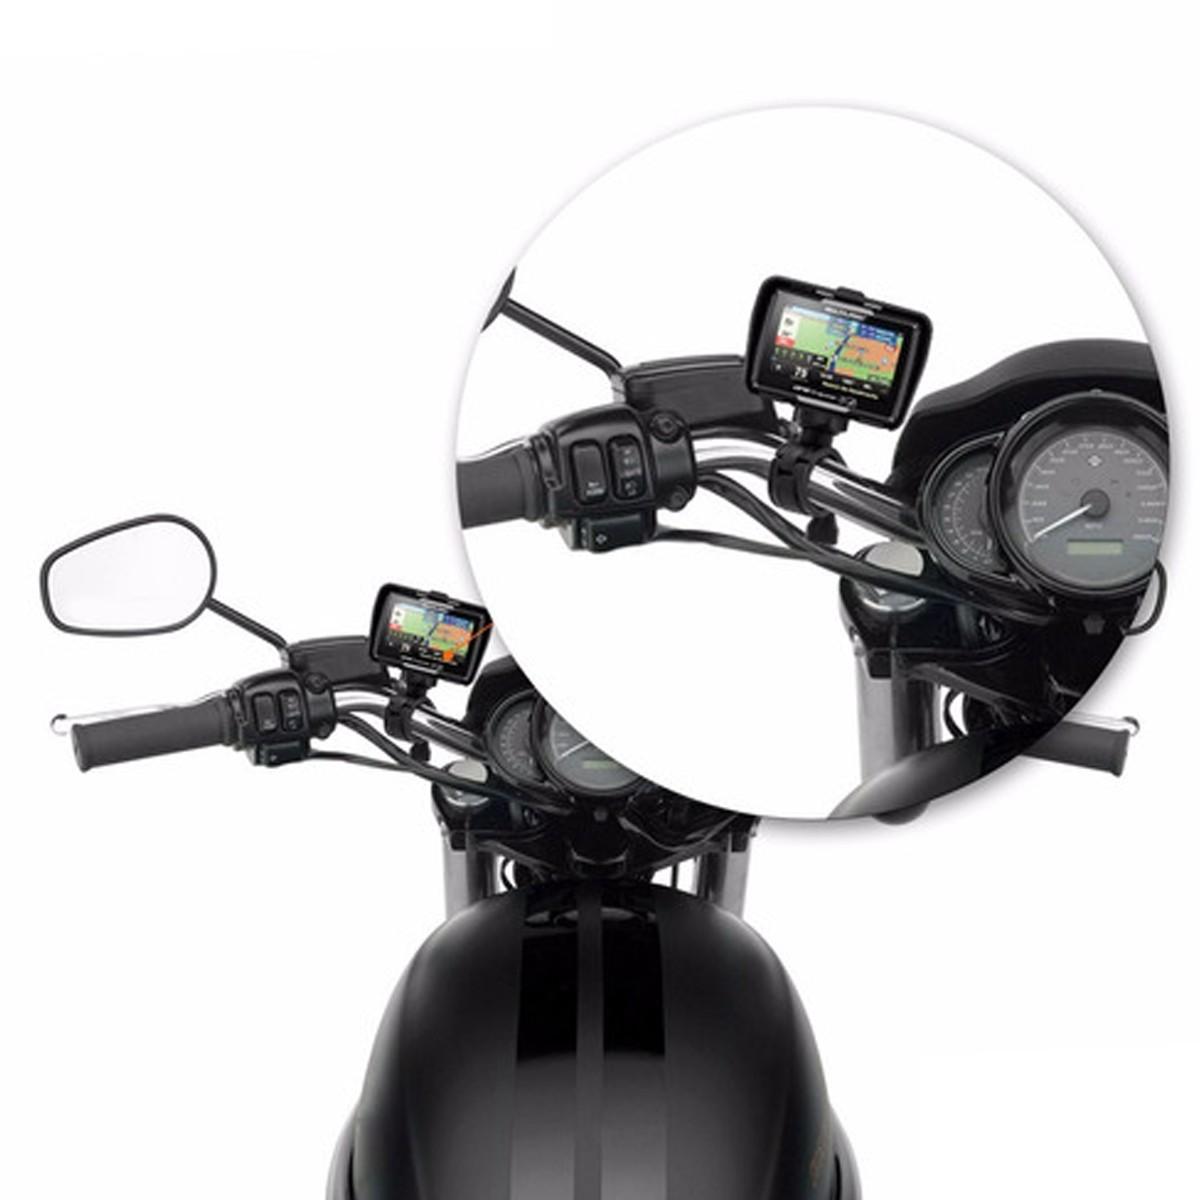 Gps para Moto À Prova DÁgua atualizado Multilaser GP040